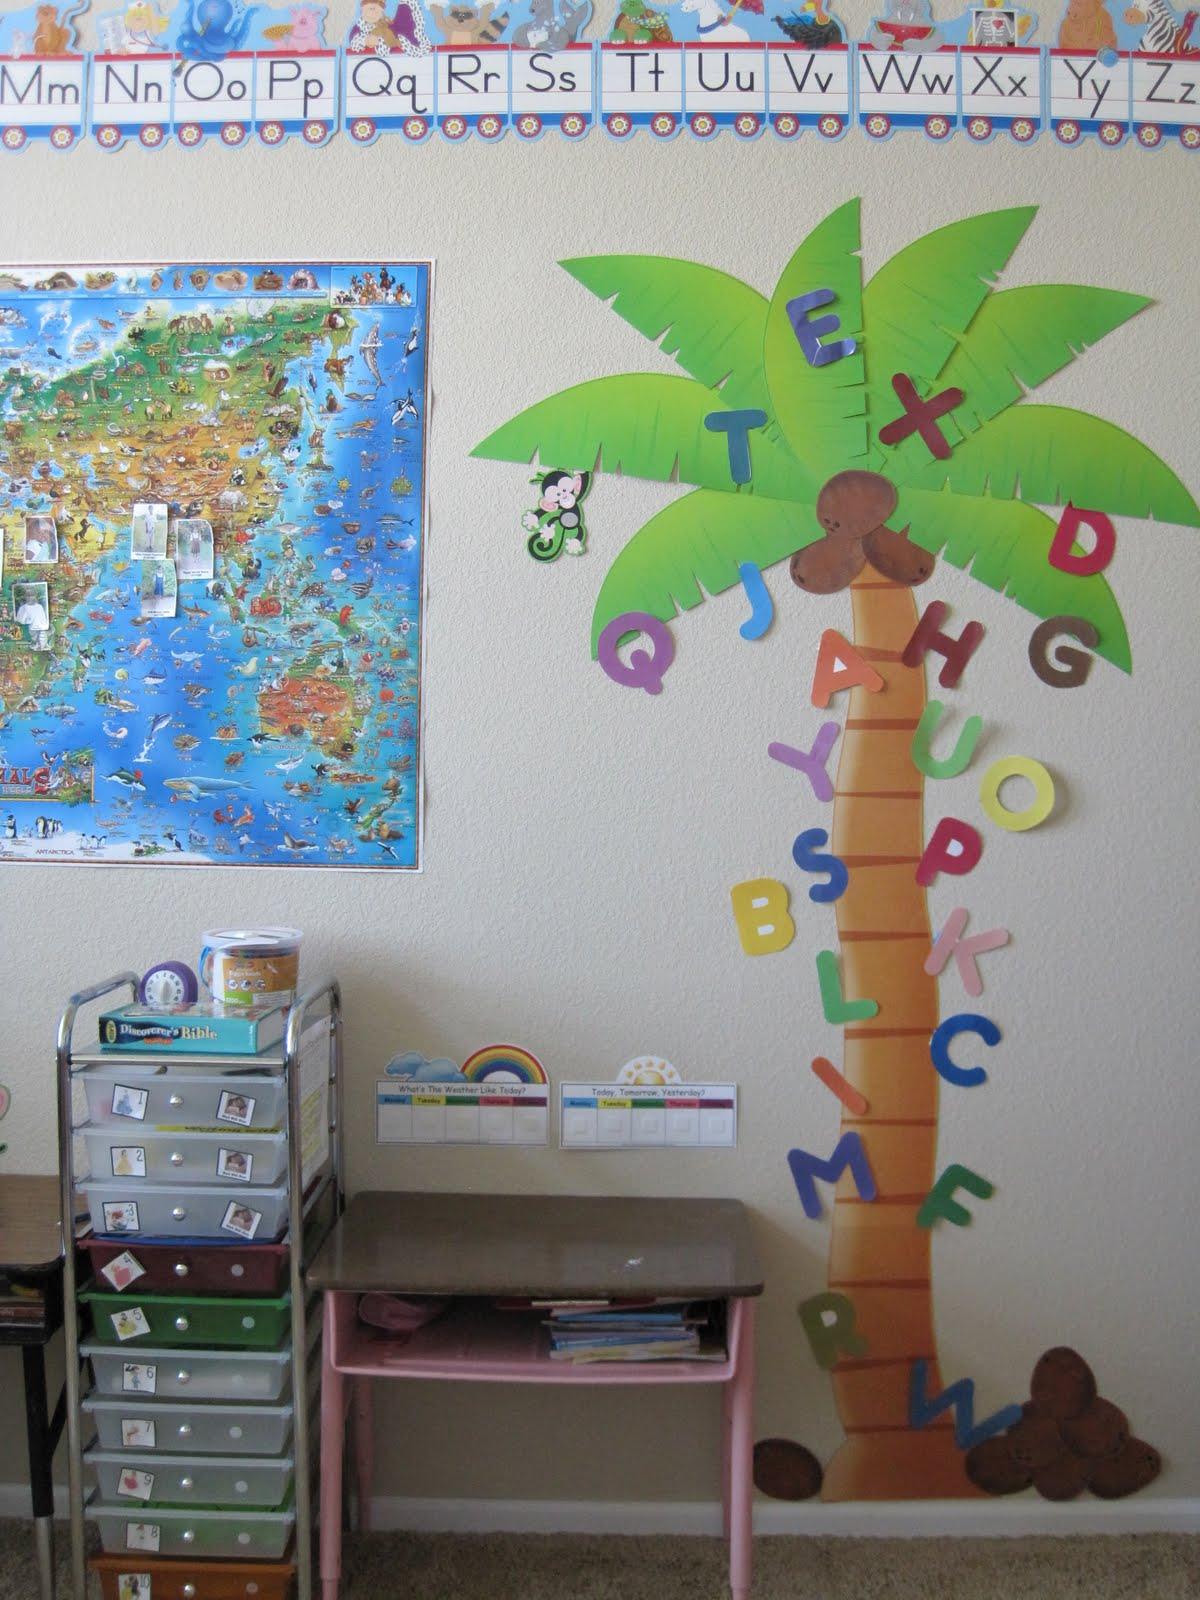 Chicka Chicka Boom Boom Confessions Of A Homeschooler